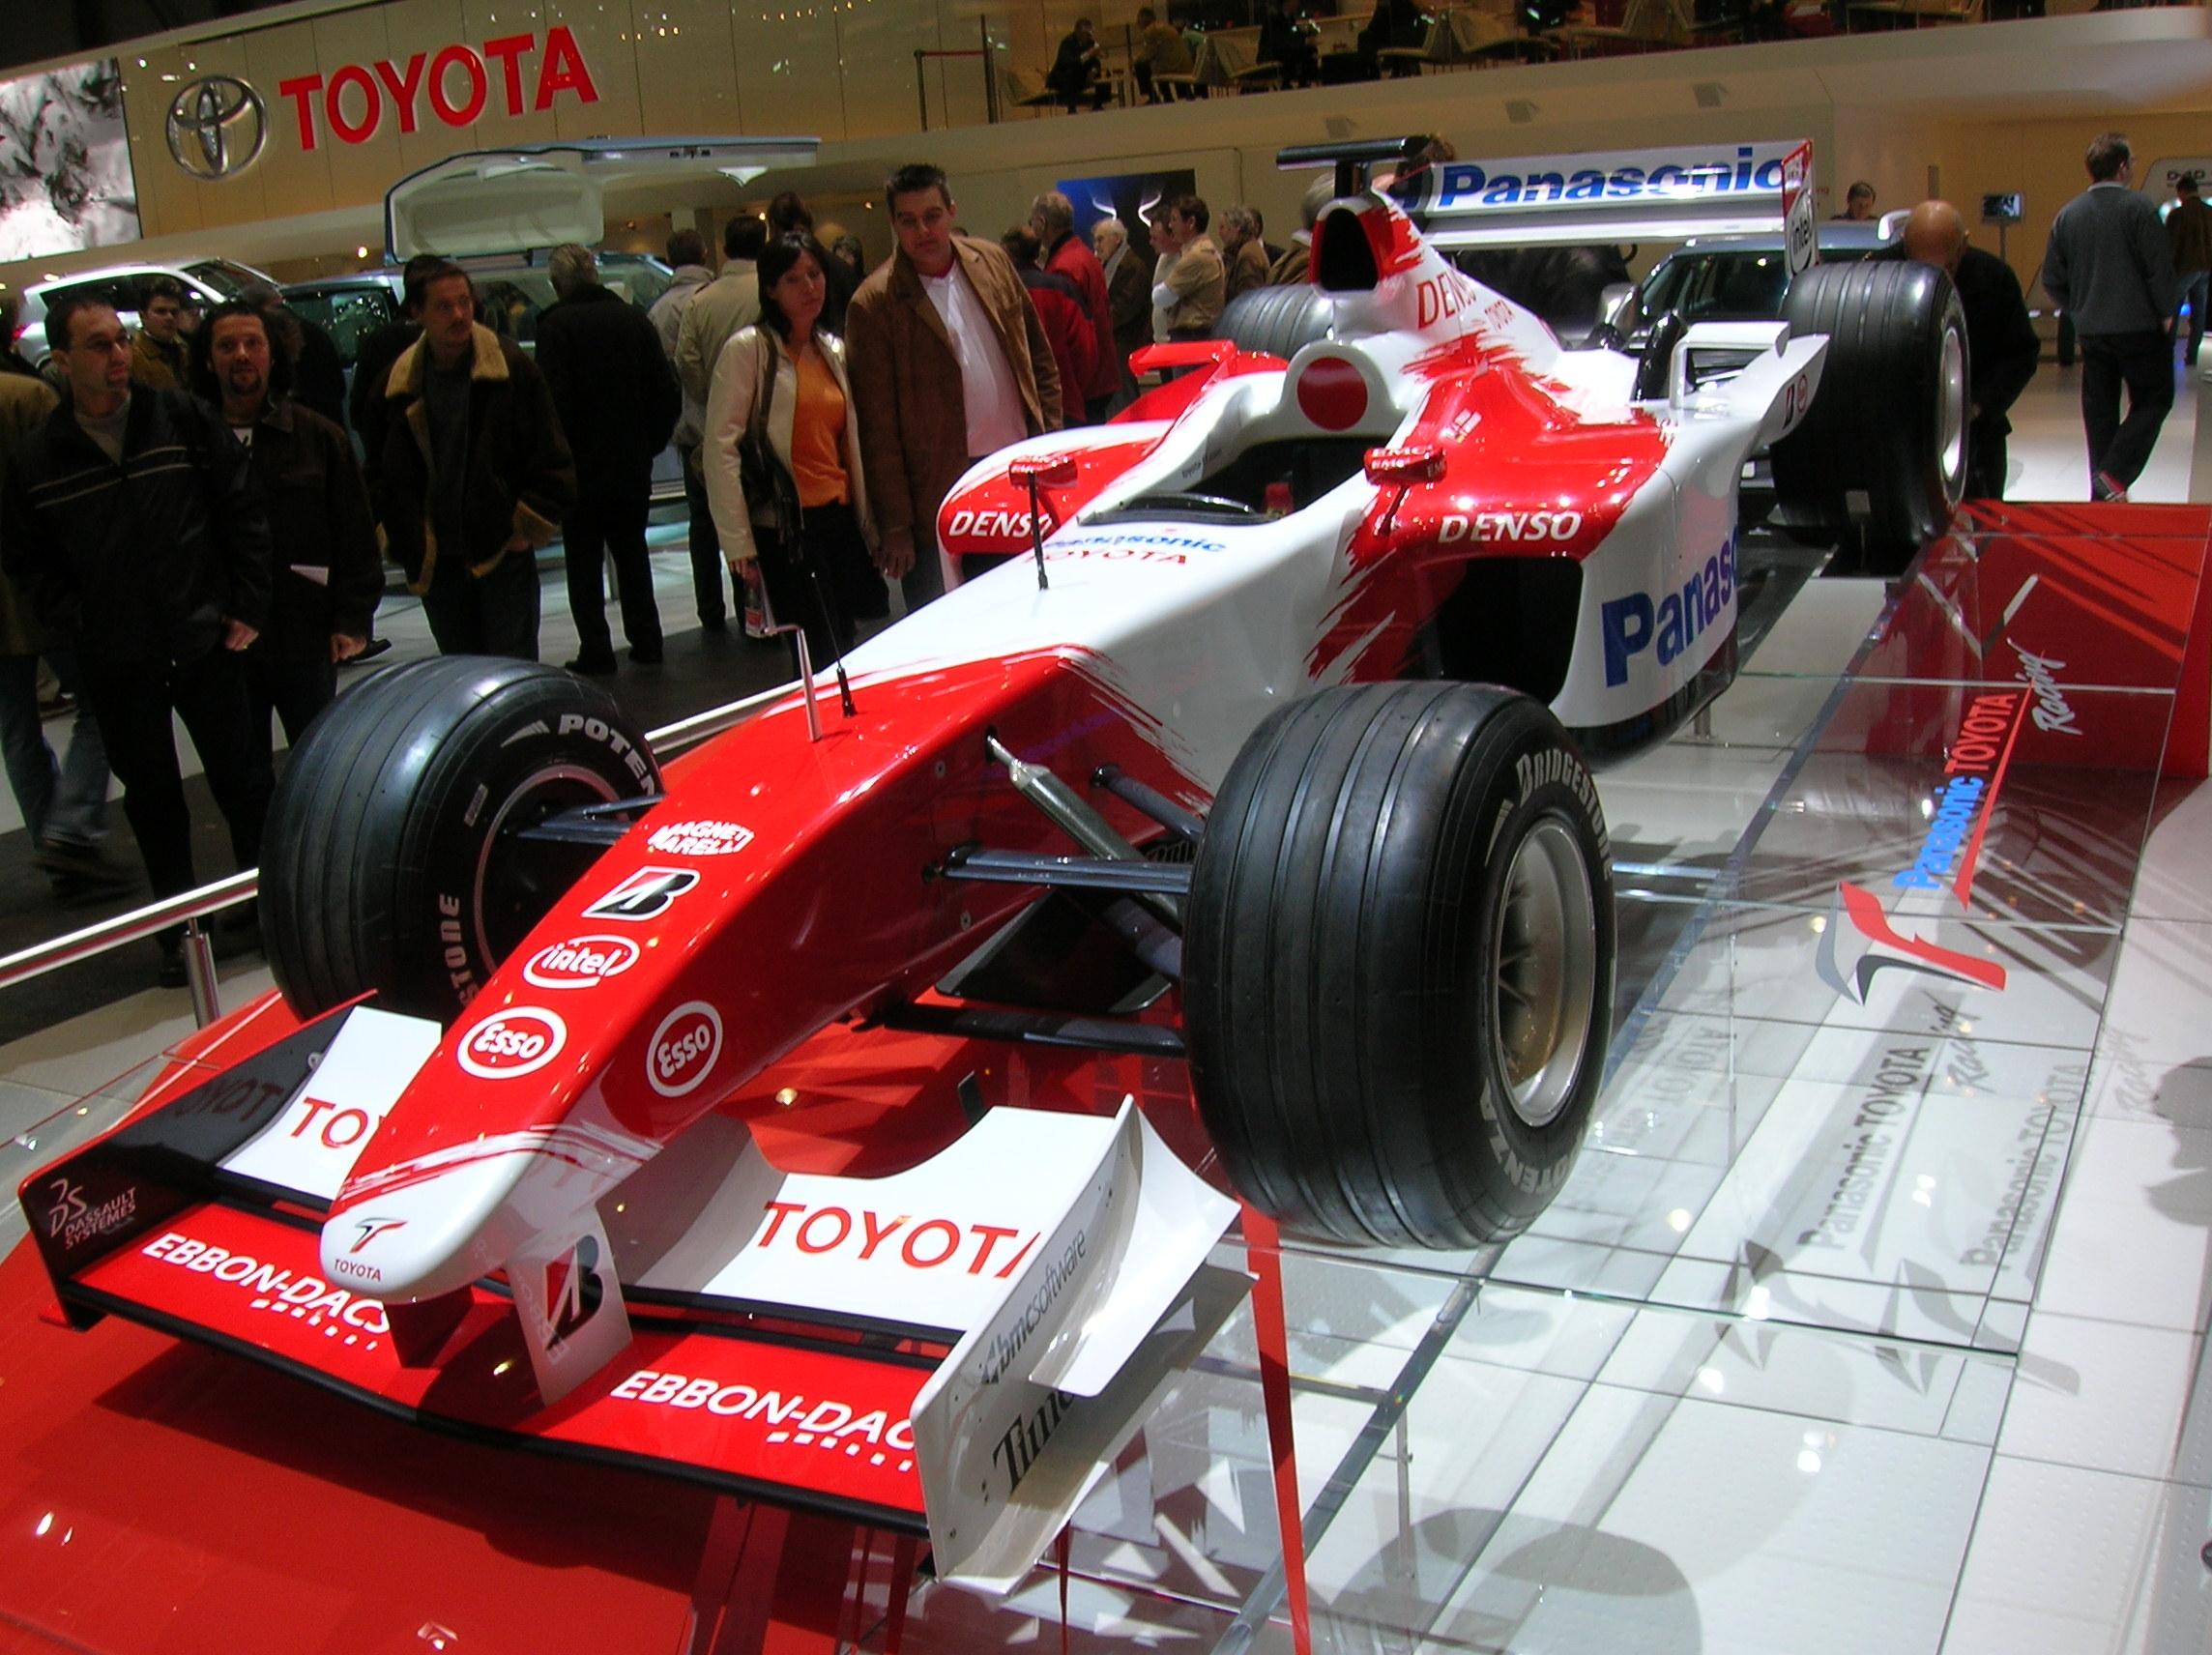 File 2006 Sag F1 Toyota 01 Jpg Wikimedia Commons